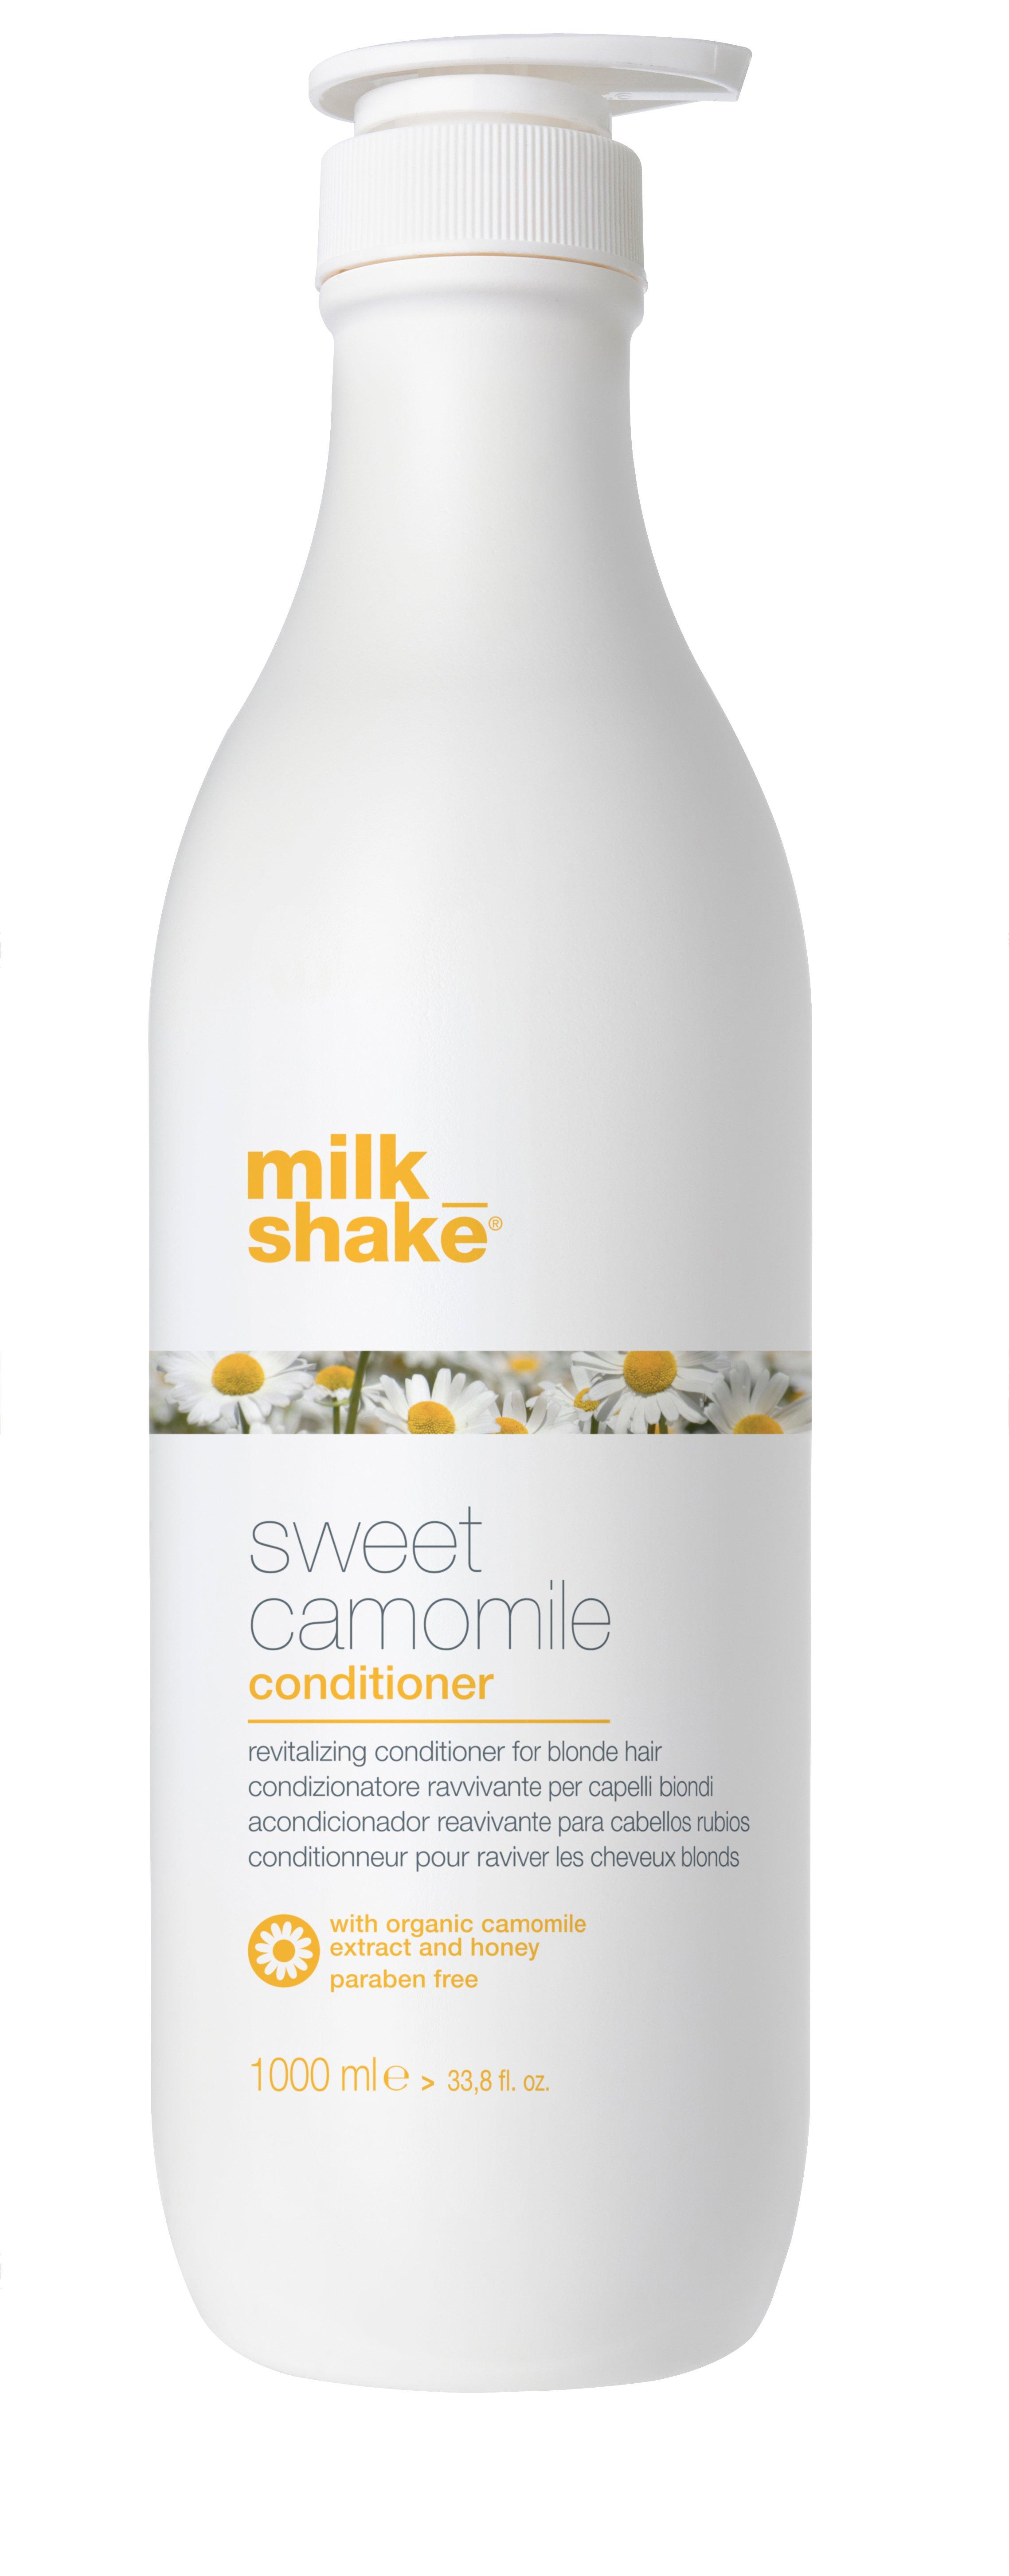 milk_shake - Sweet Camomile Conditioner 1000 ml